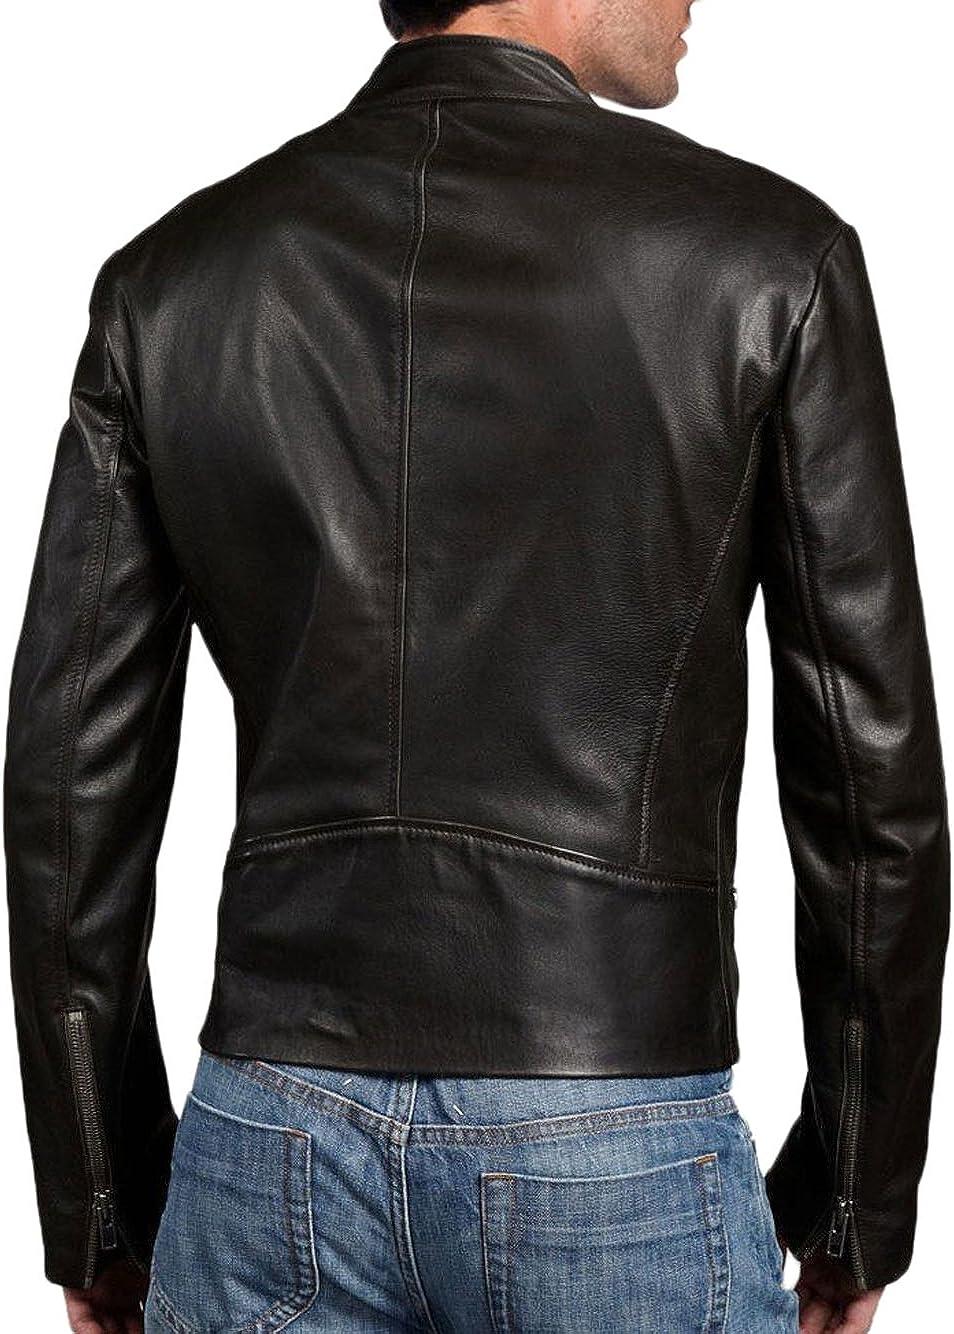 Men Leather Jacket New Soft Lambskin Slim Biker Bomber Coat T1321